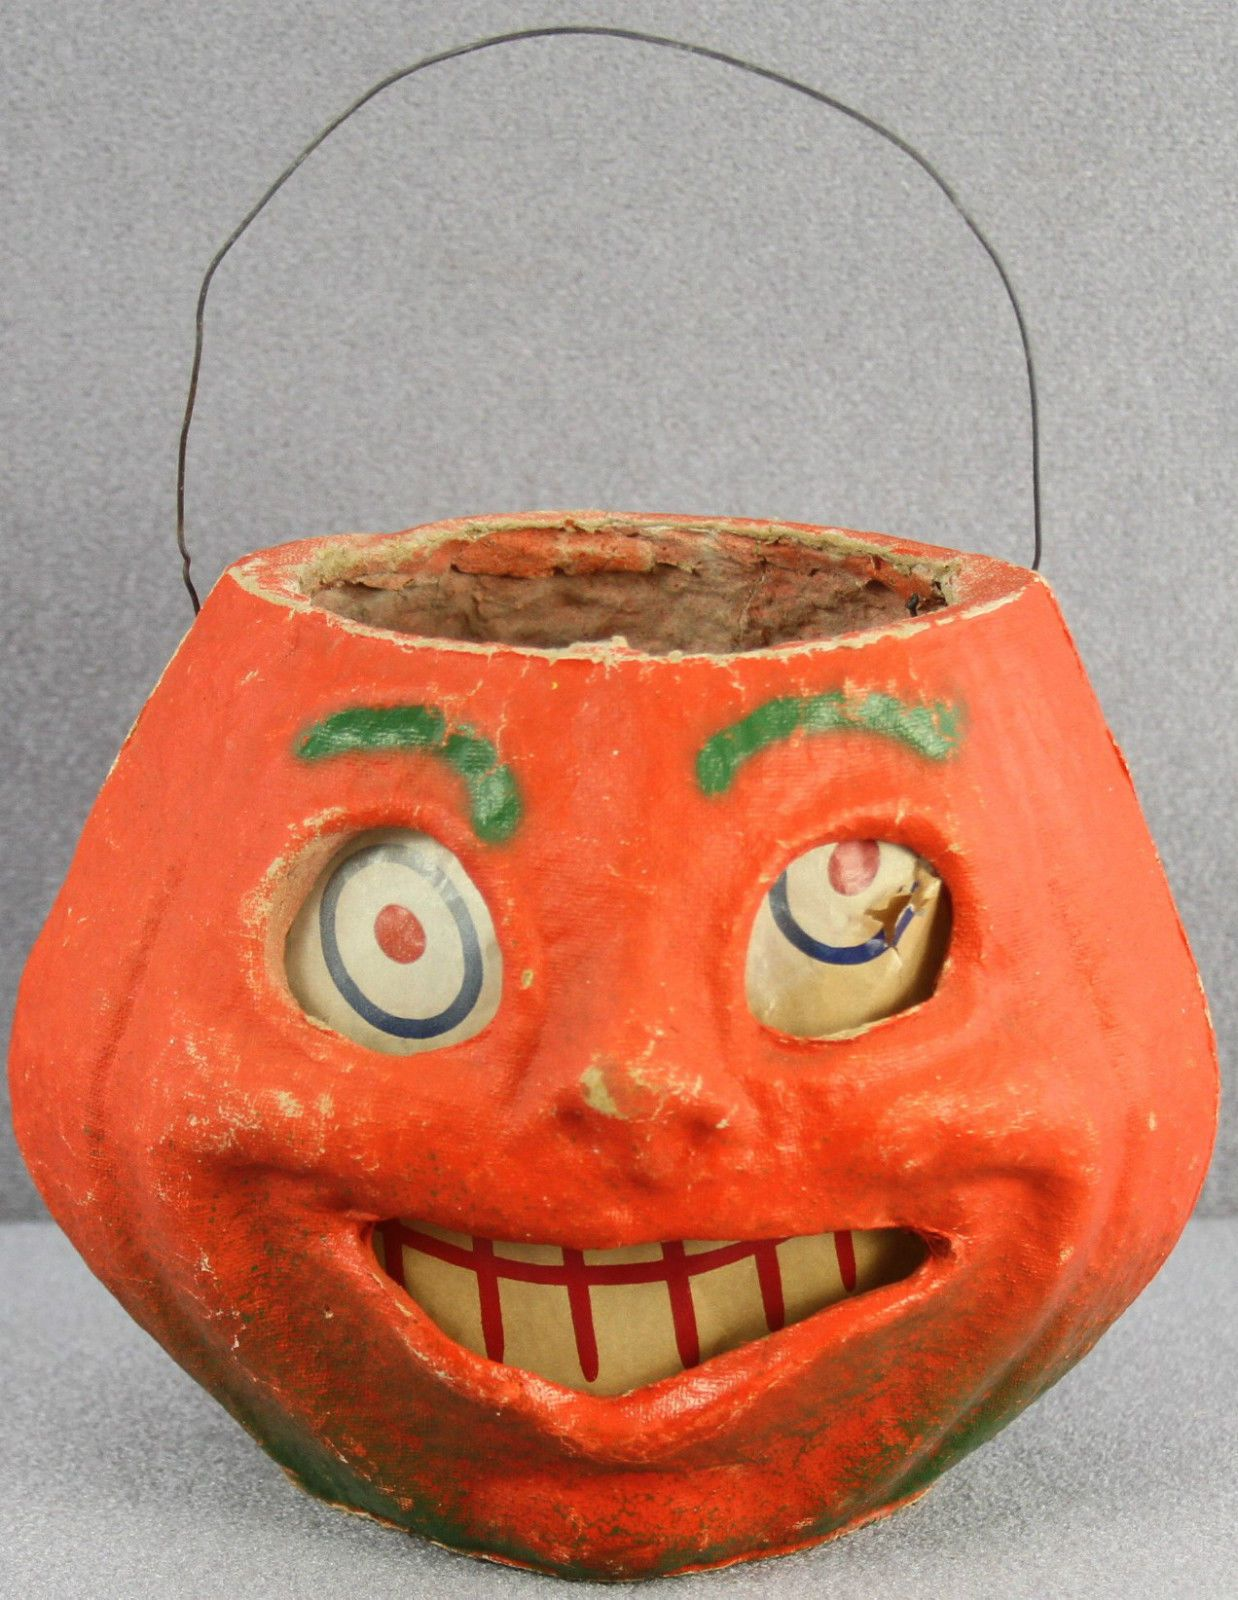 43 vintage halloween pulp paper jack o lantern pumpkin 5 1 2 big toothy grin